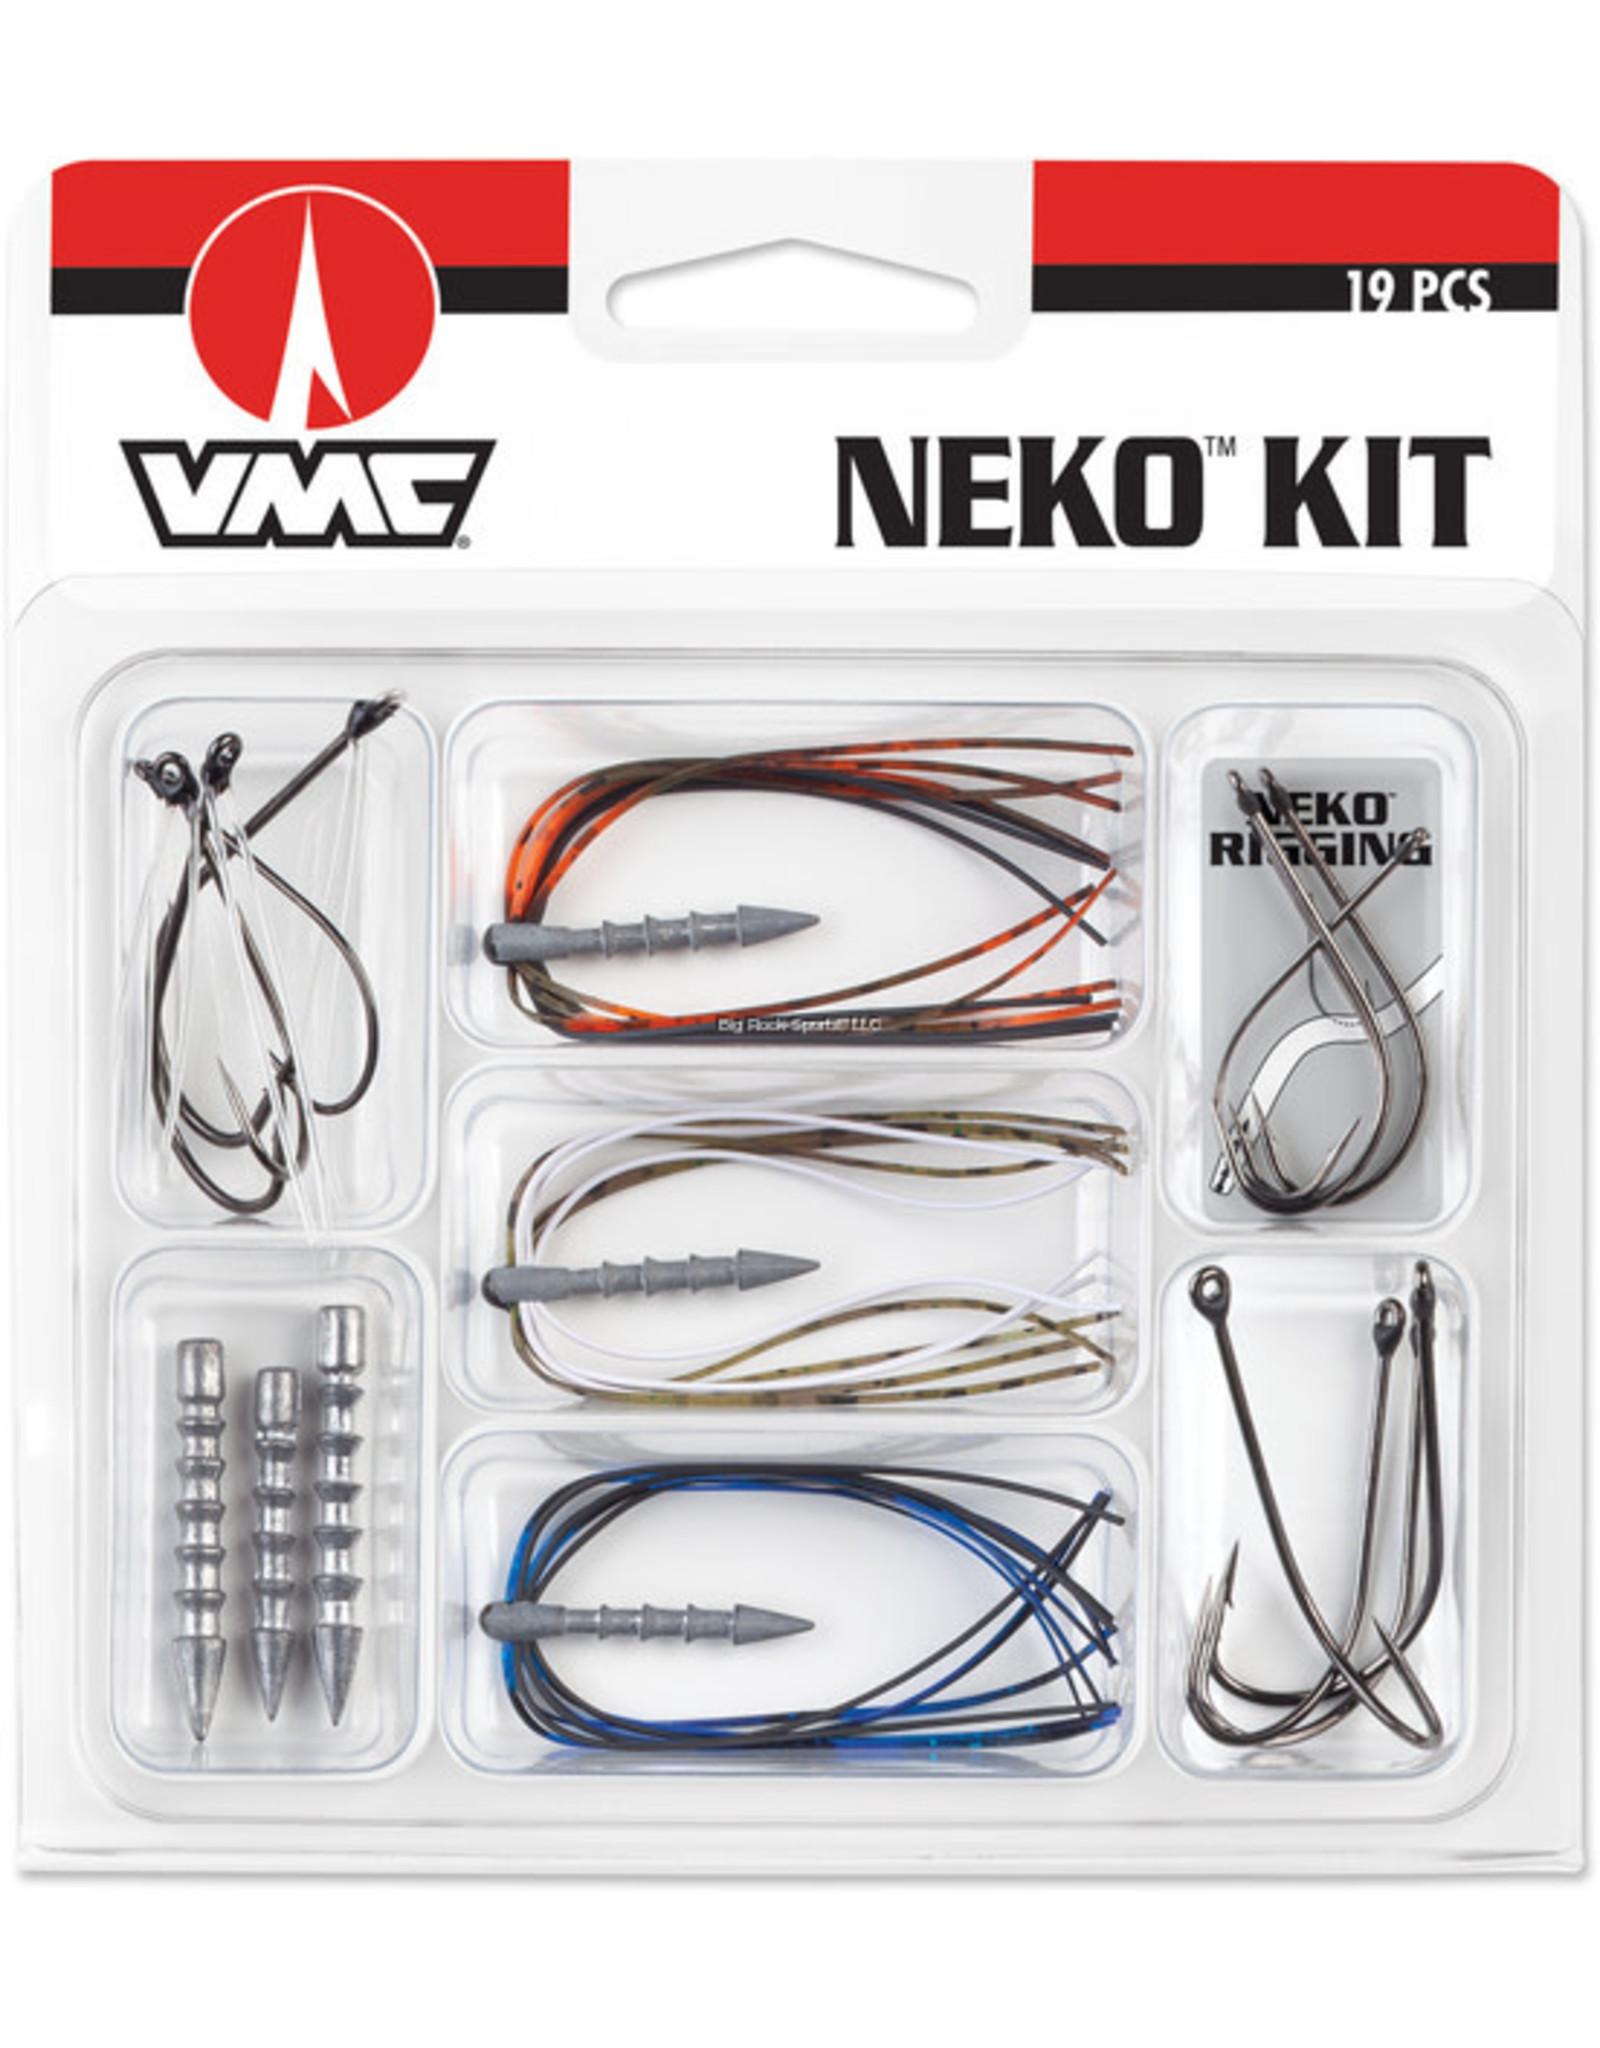 VMC Neko Rigging Kit